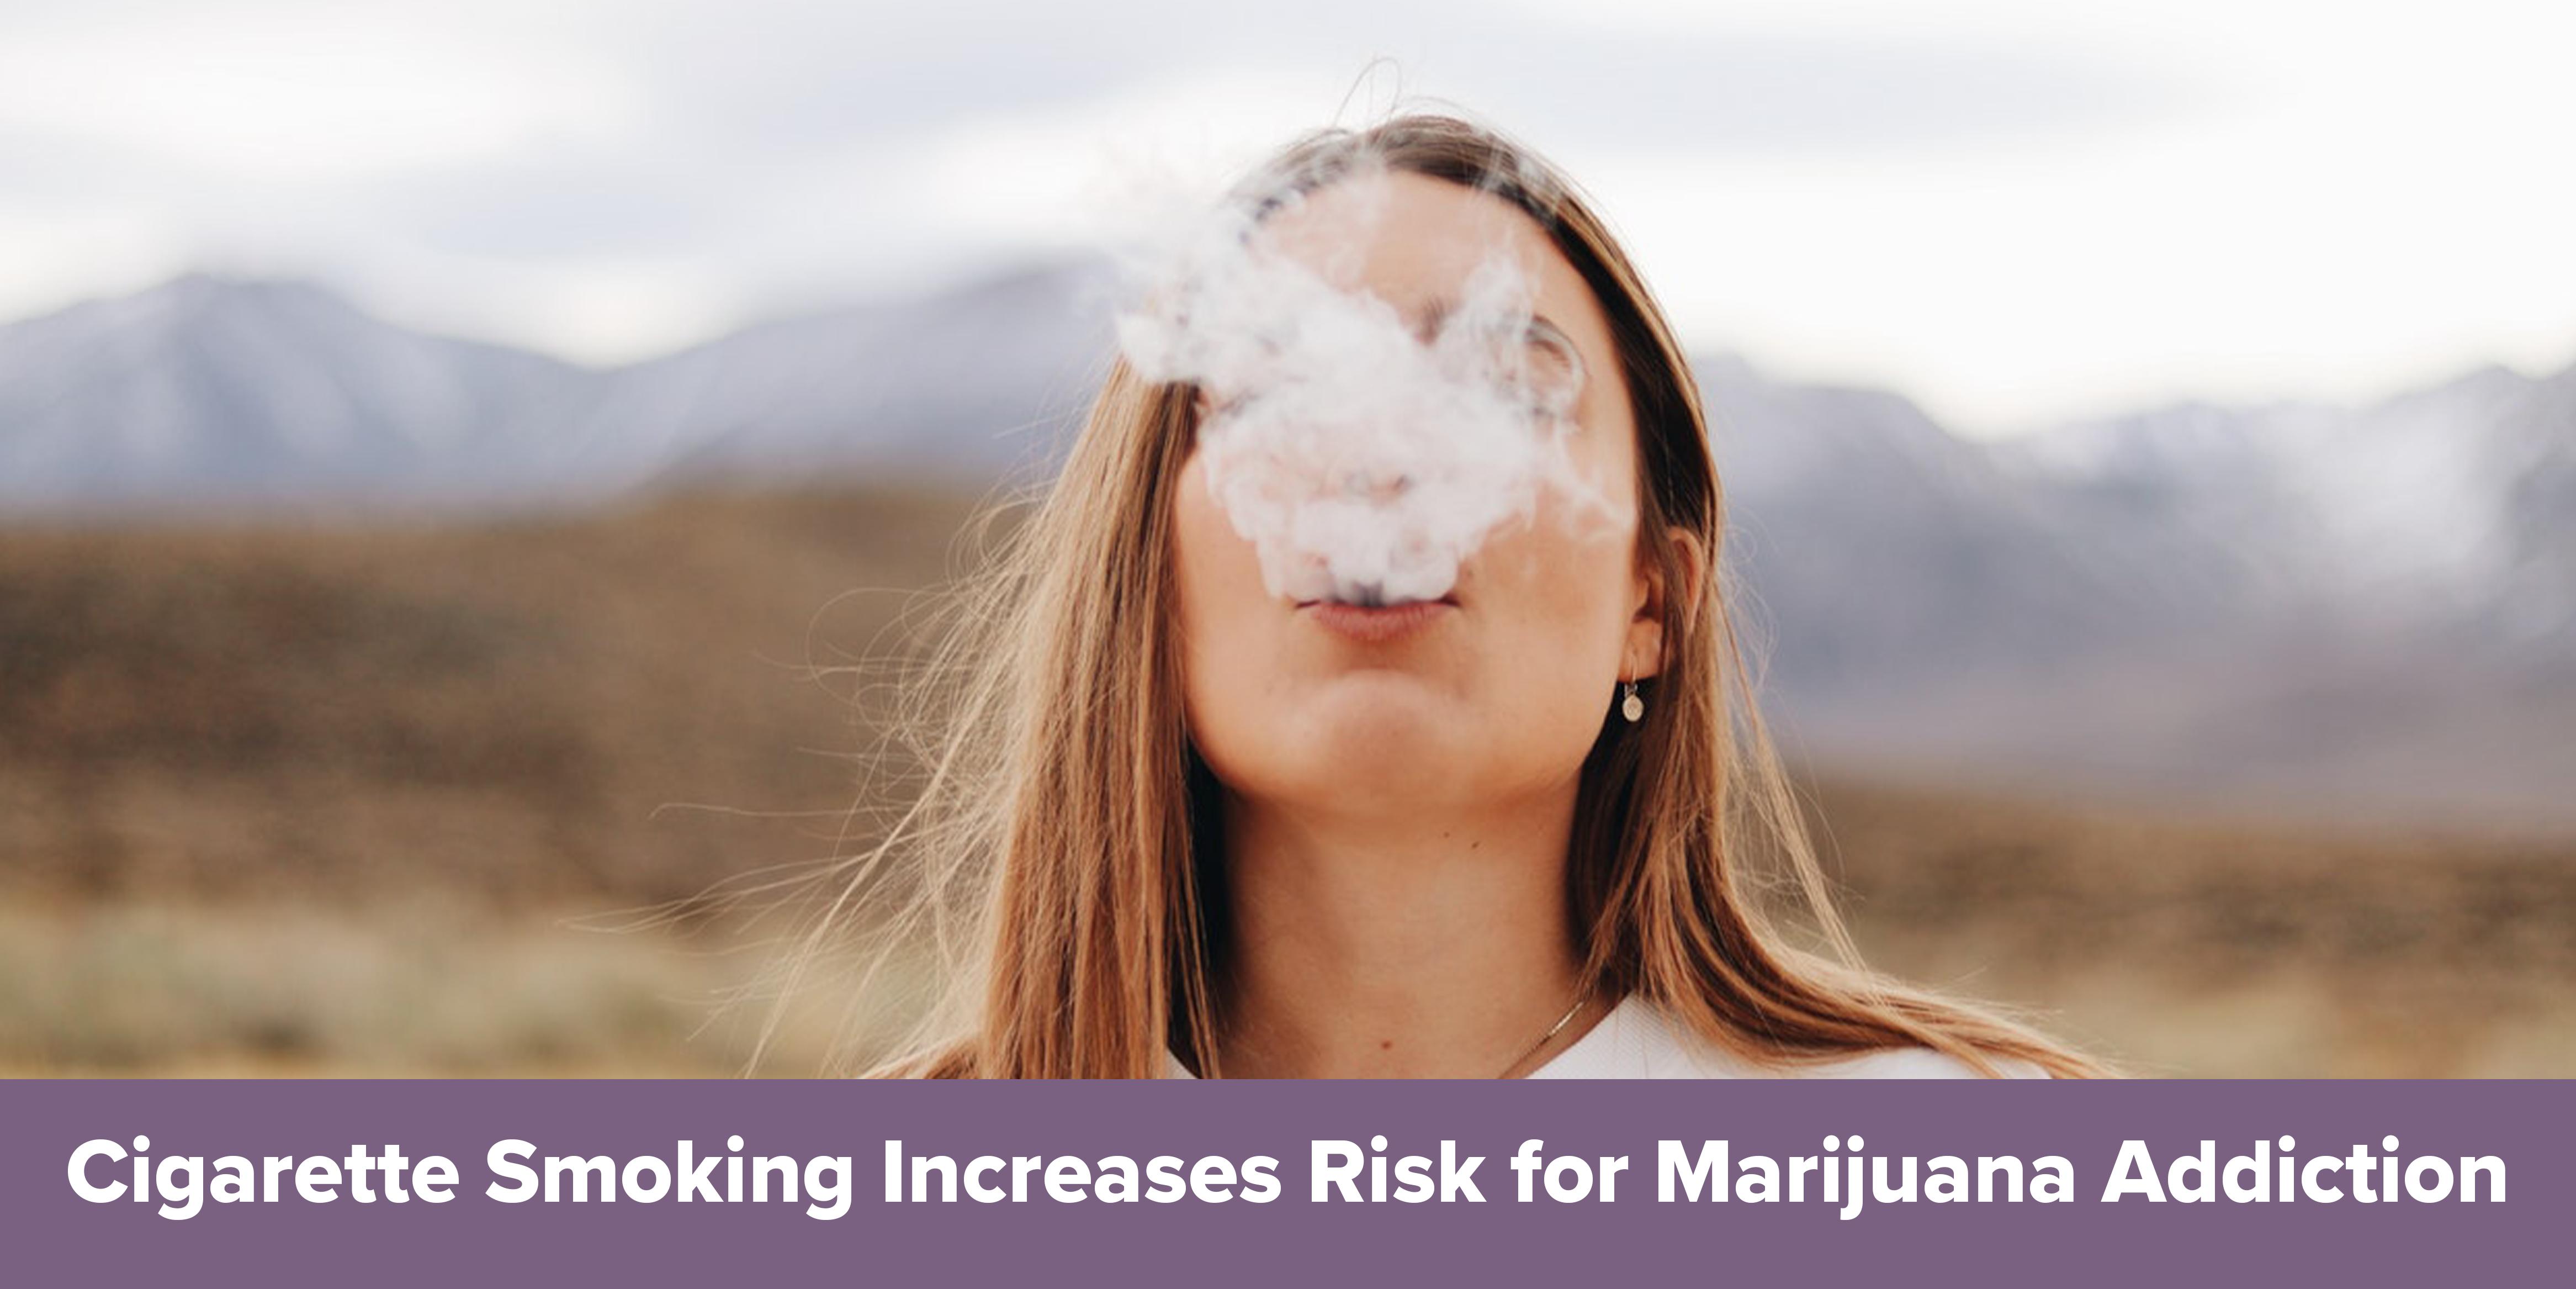 Cigarette Smoking Increases Risk for Marijuana Addiction